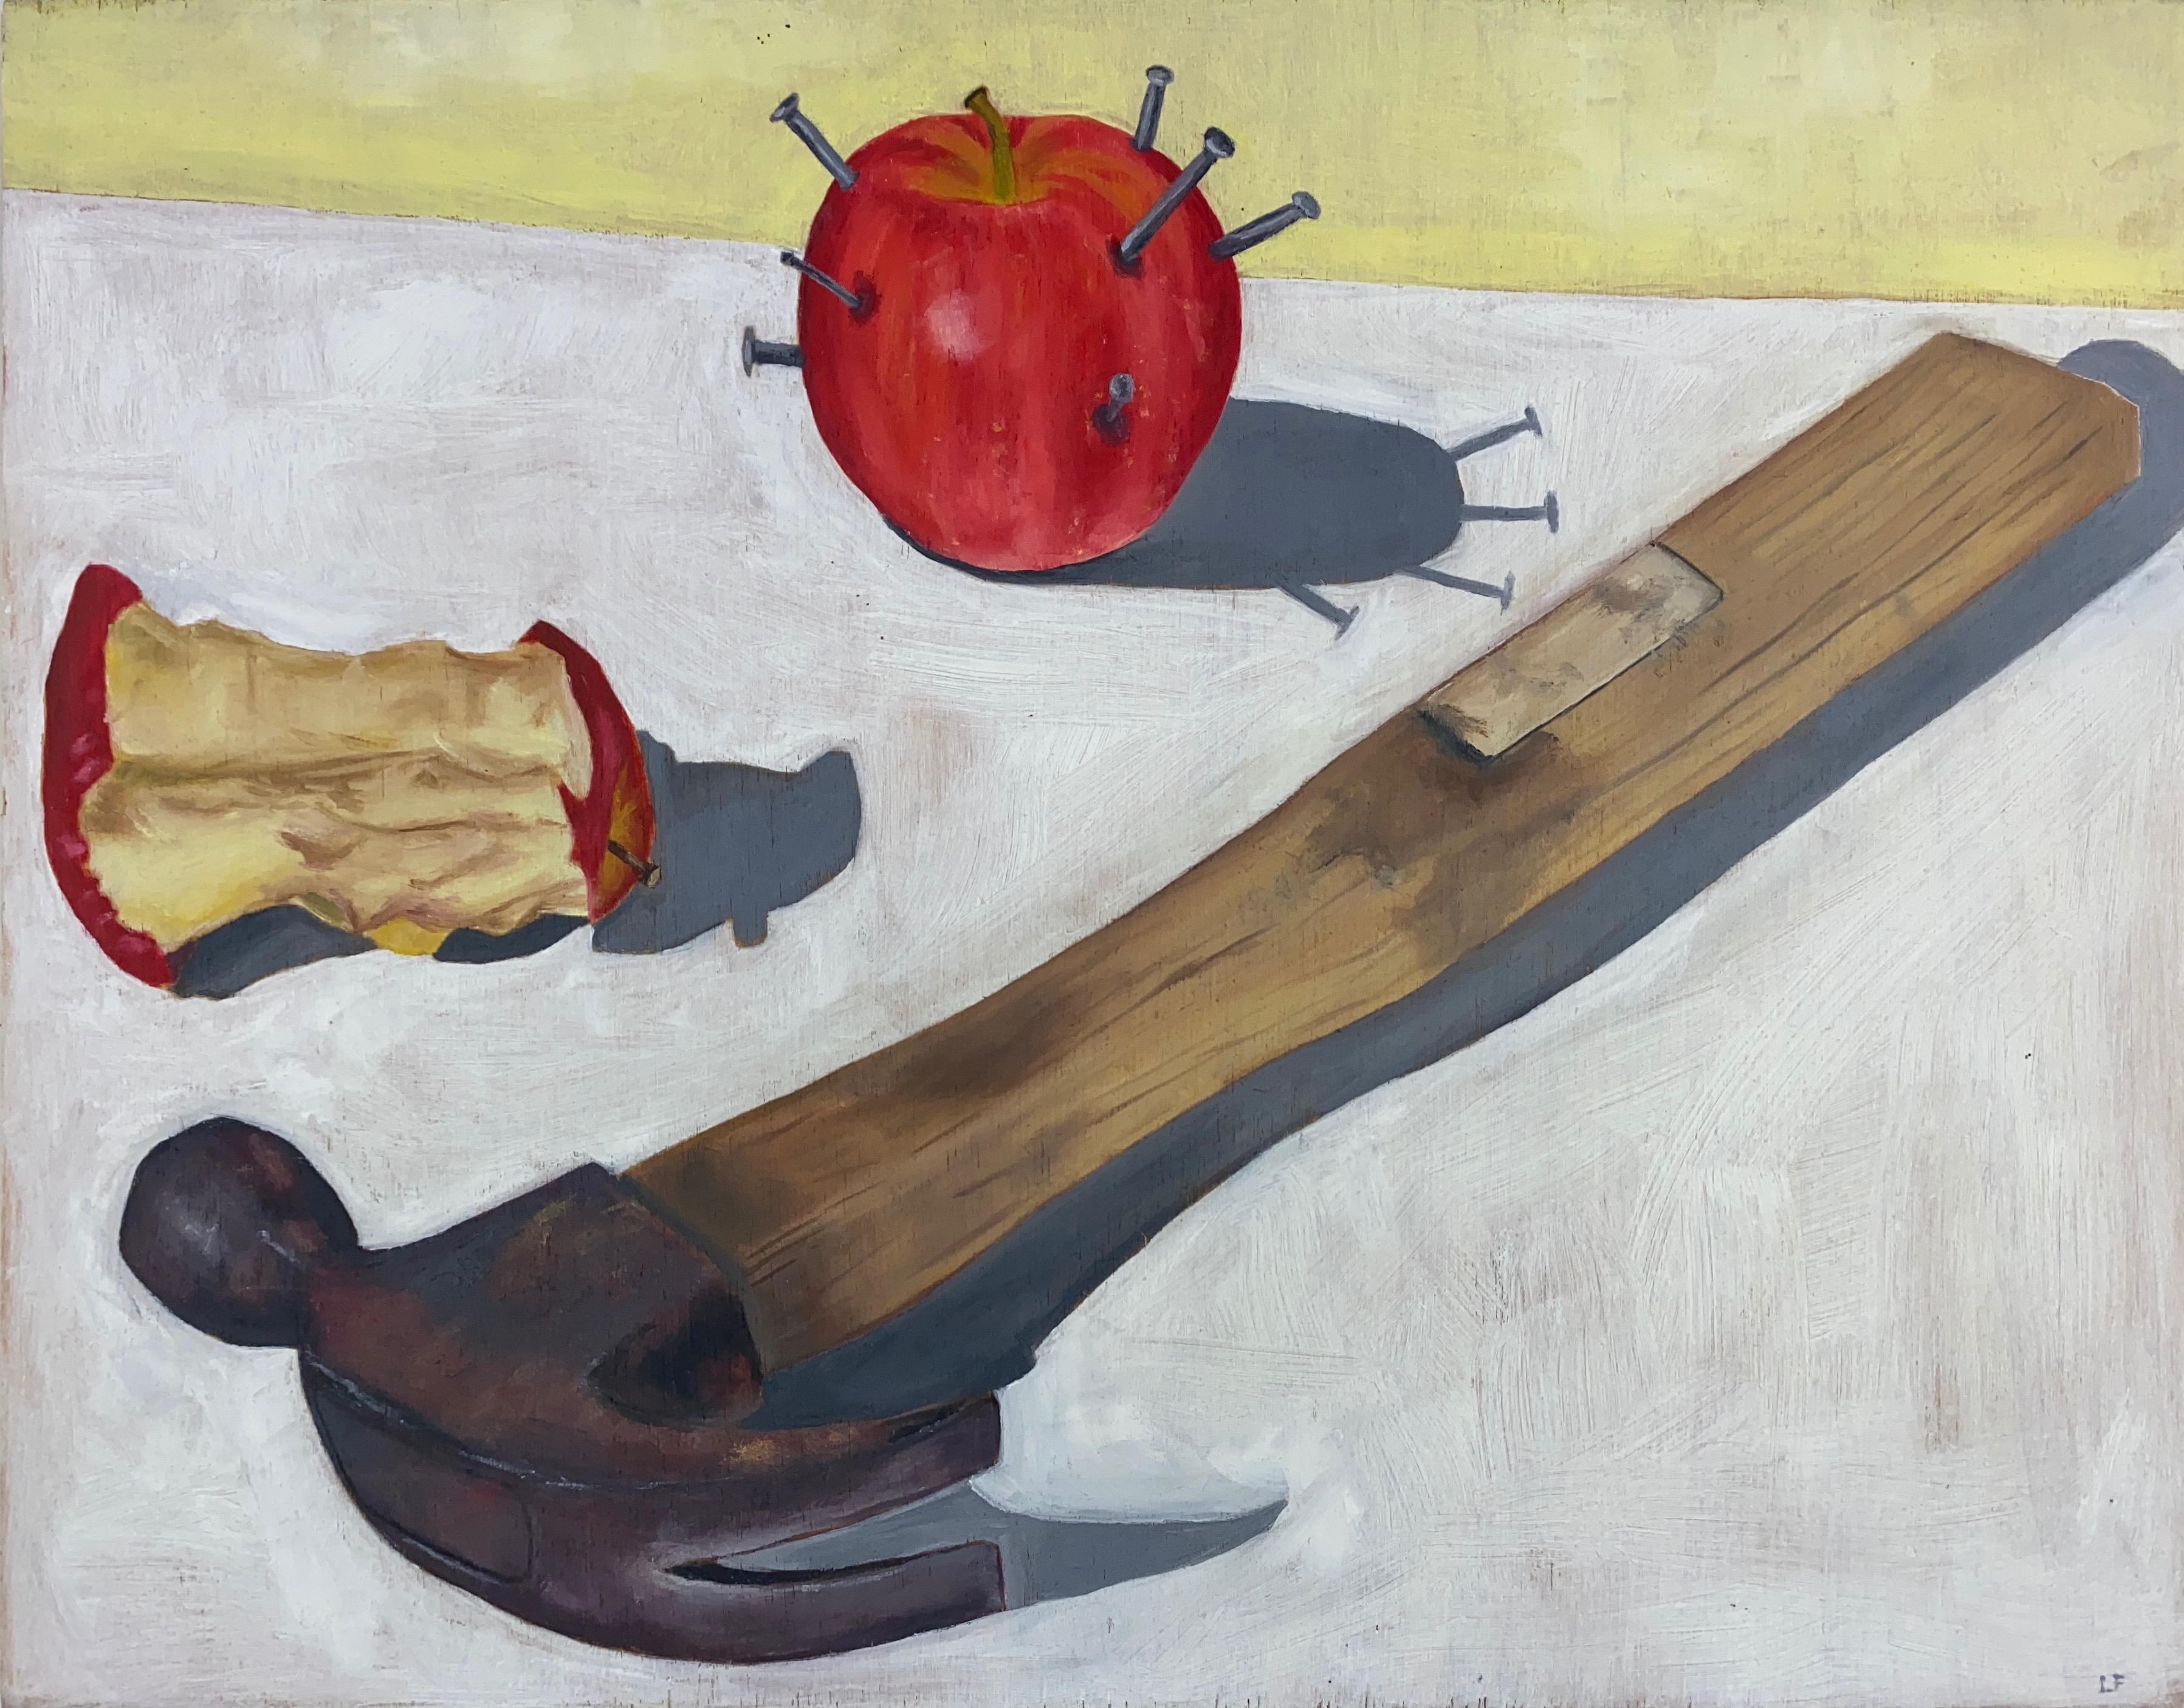 Hammer, Apple, Nails.